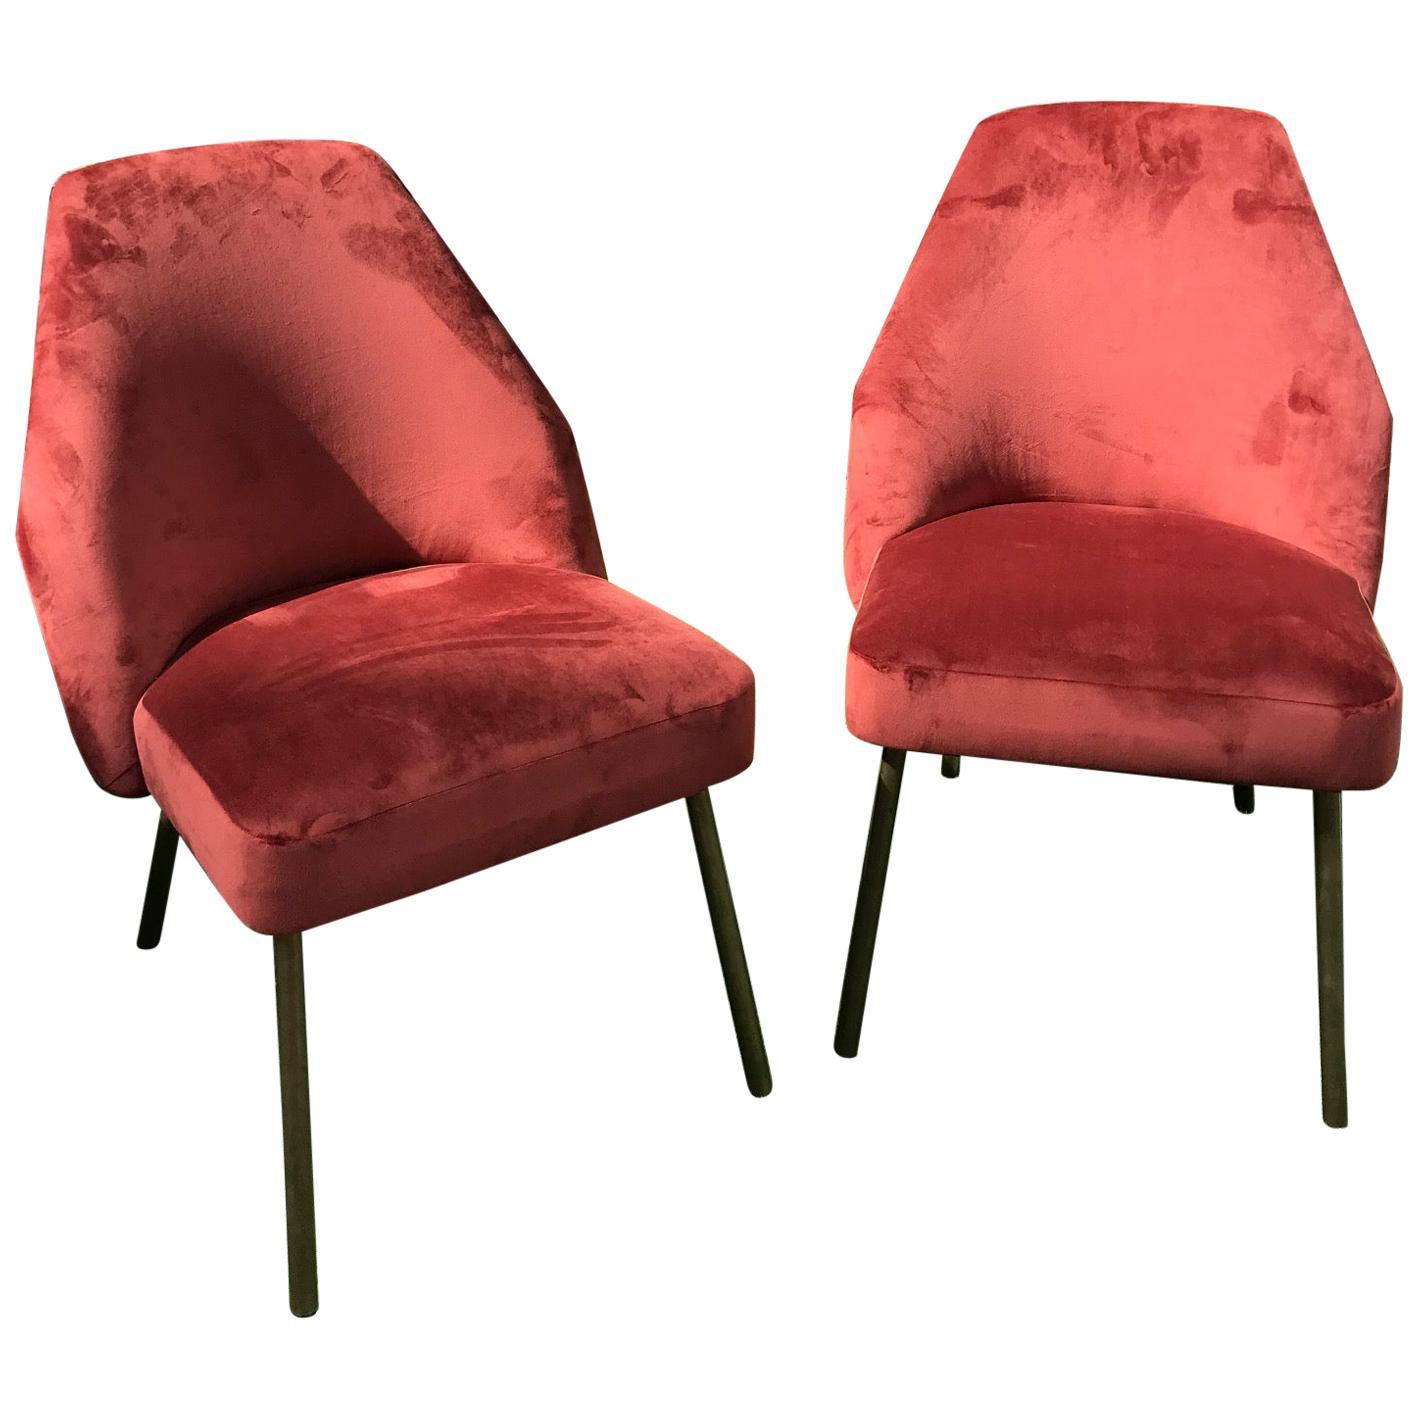 Pair of Campanula Chairs by Carlo Pagani for Arflex